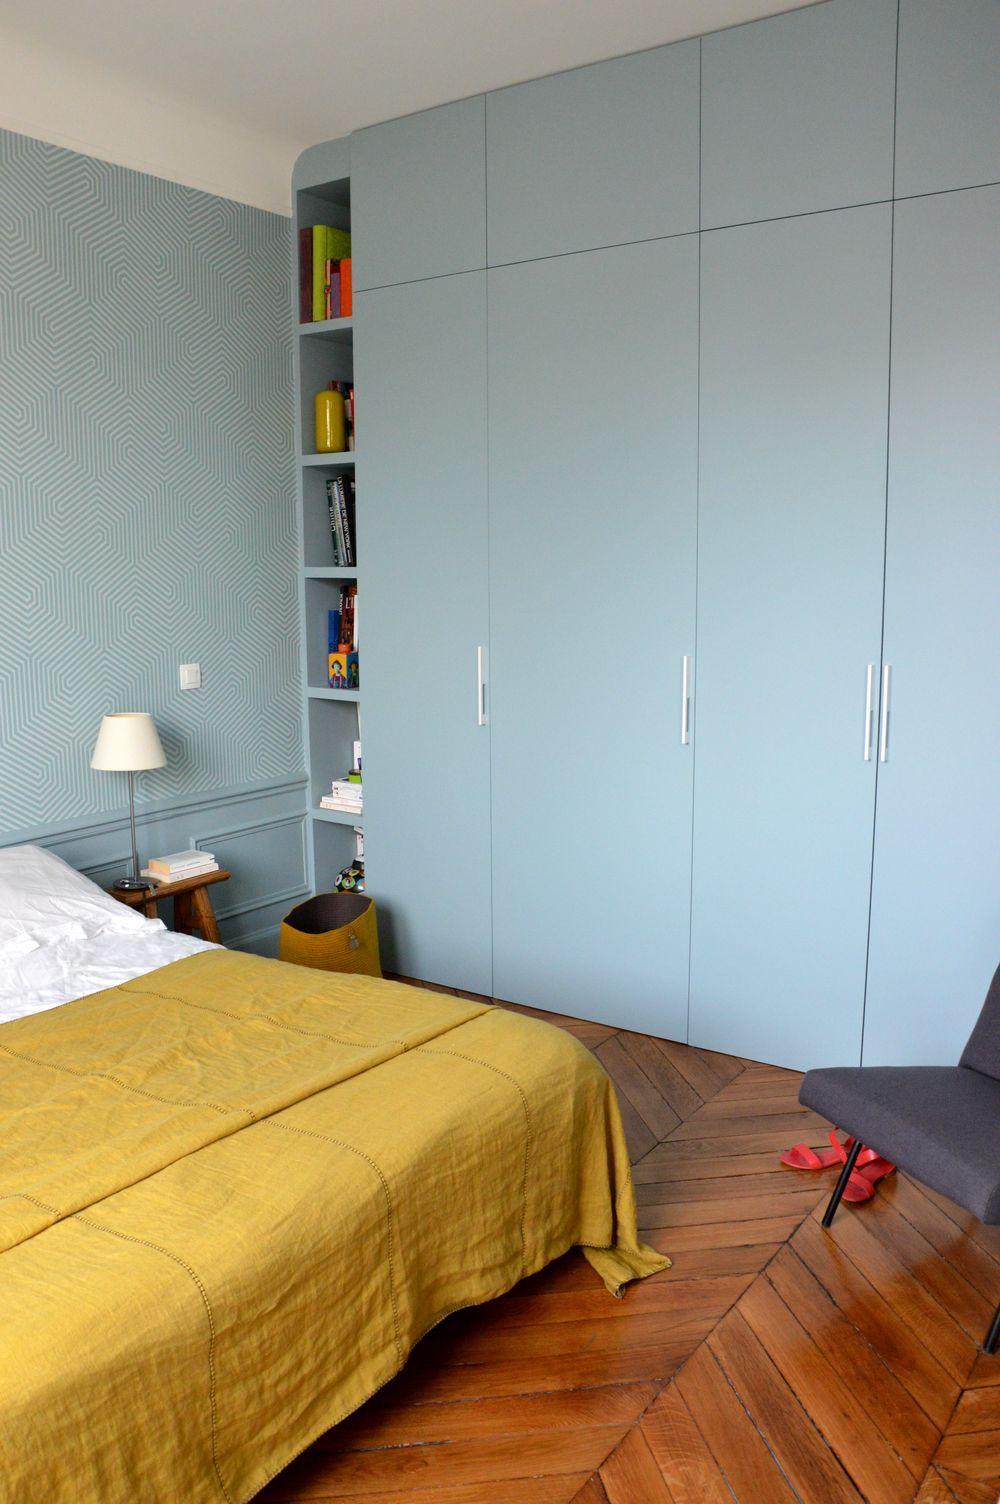 Vert chambre feng shui - Bleu chambre feng shui ...